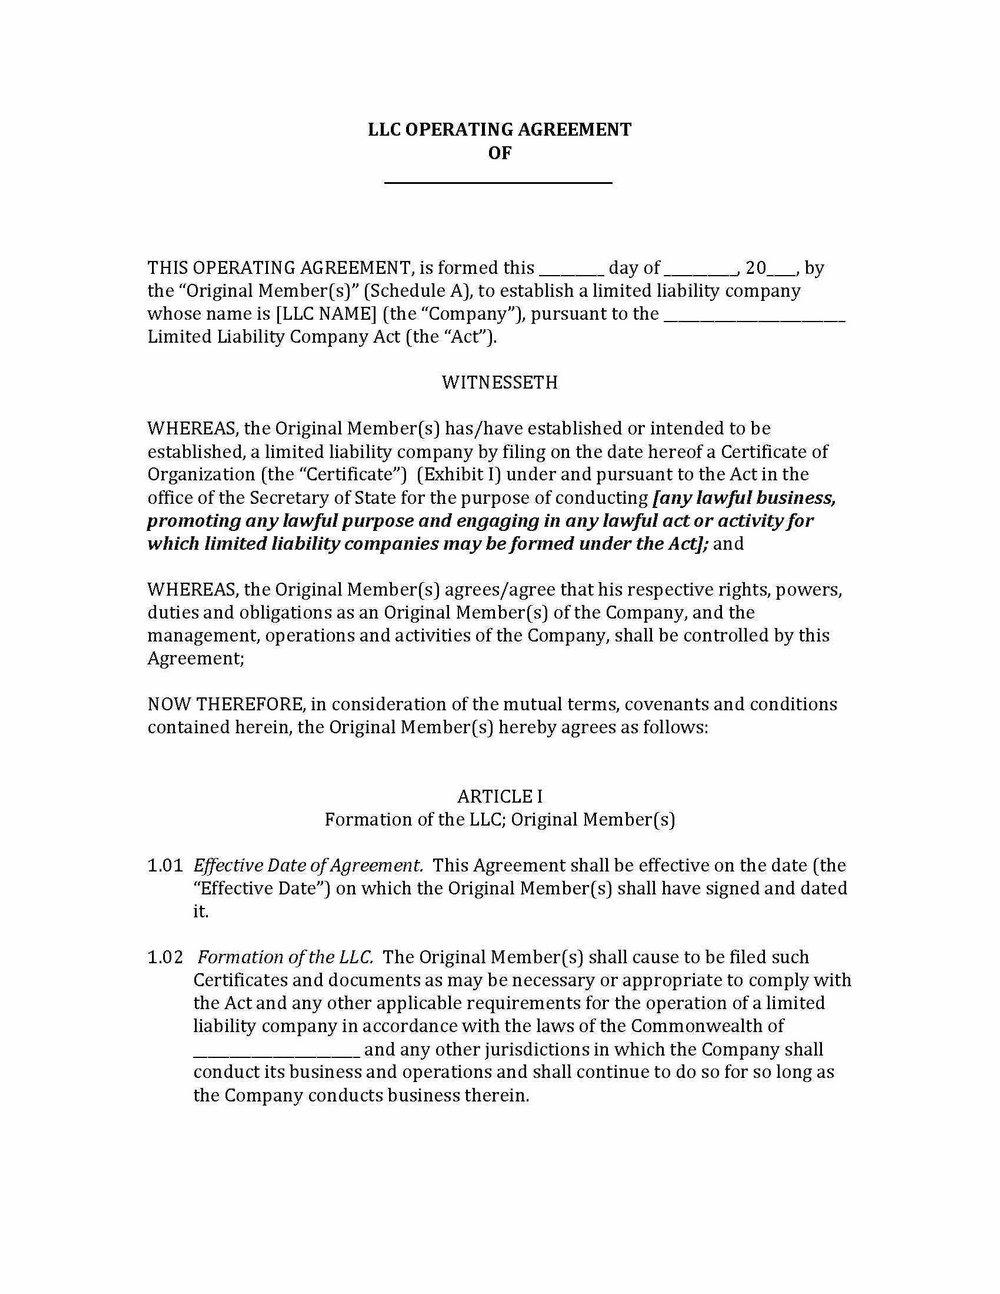 Single Member Llc Resolution Template